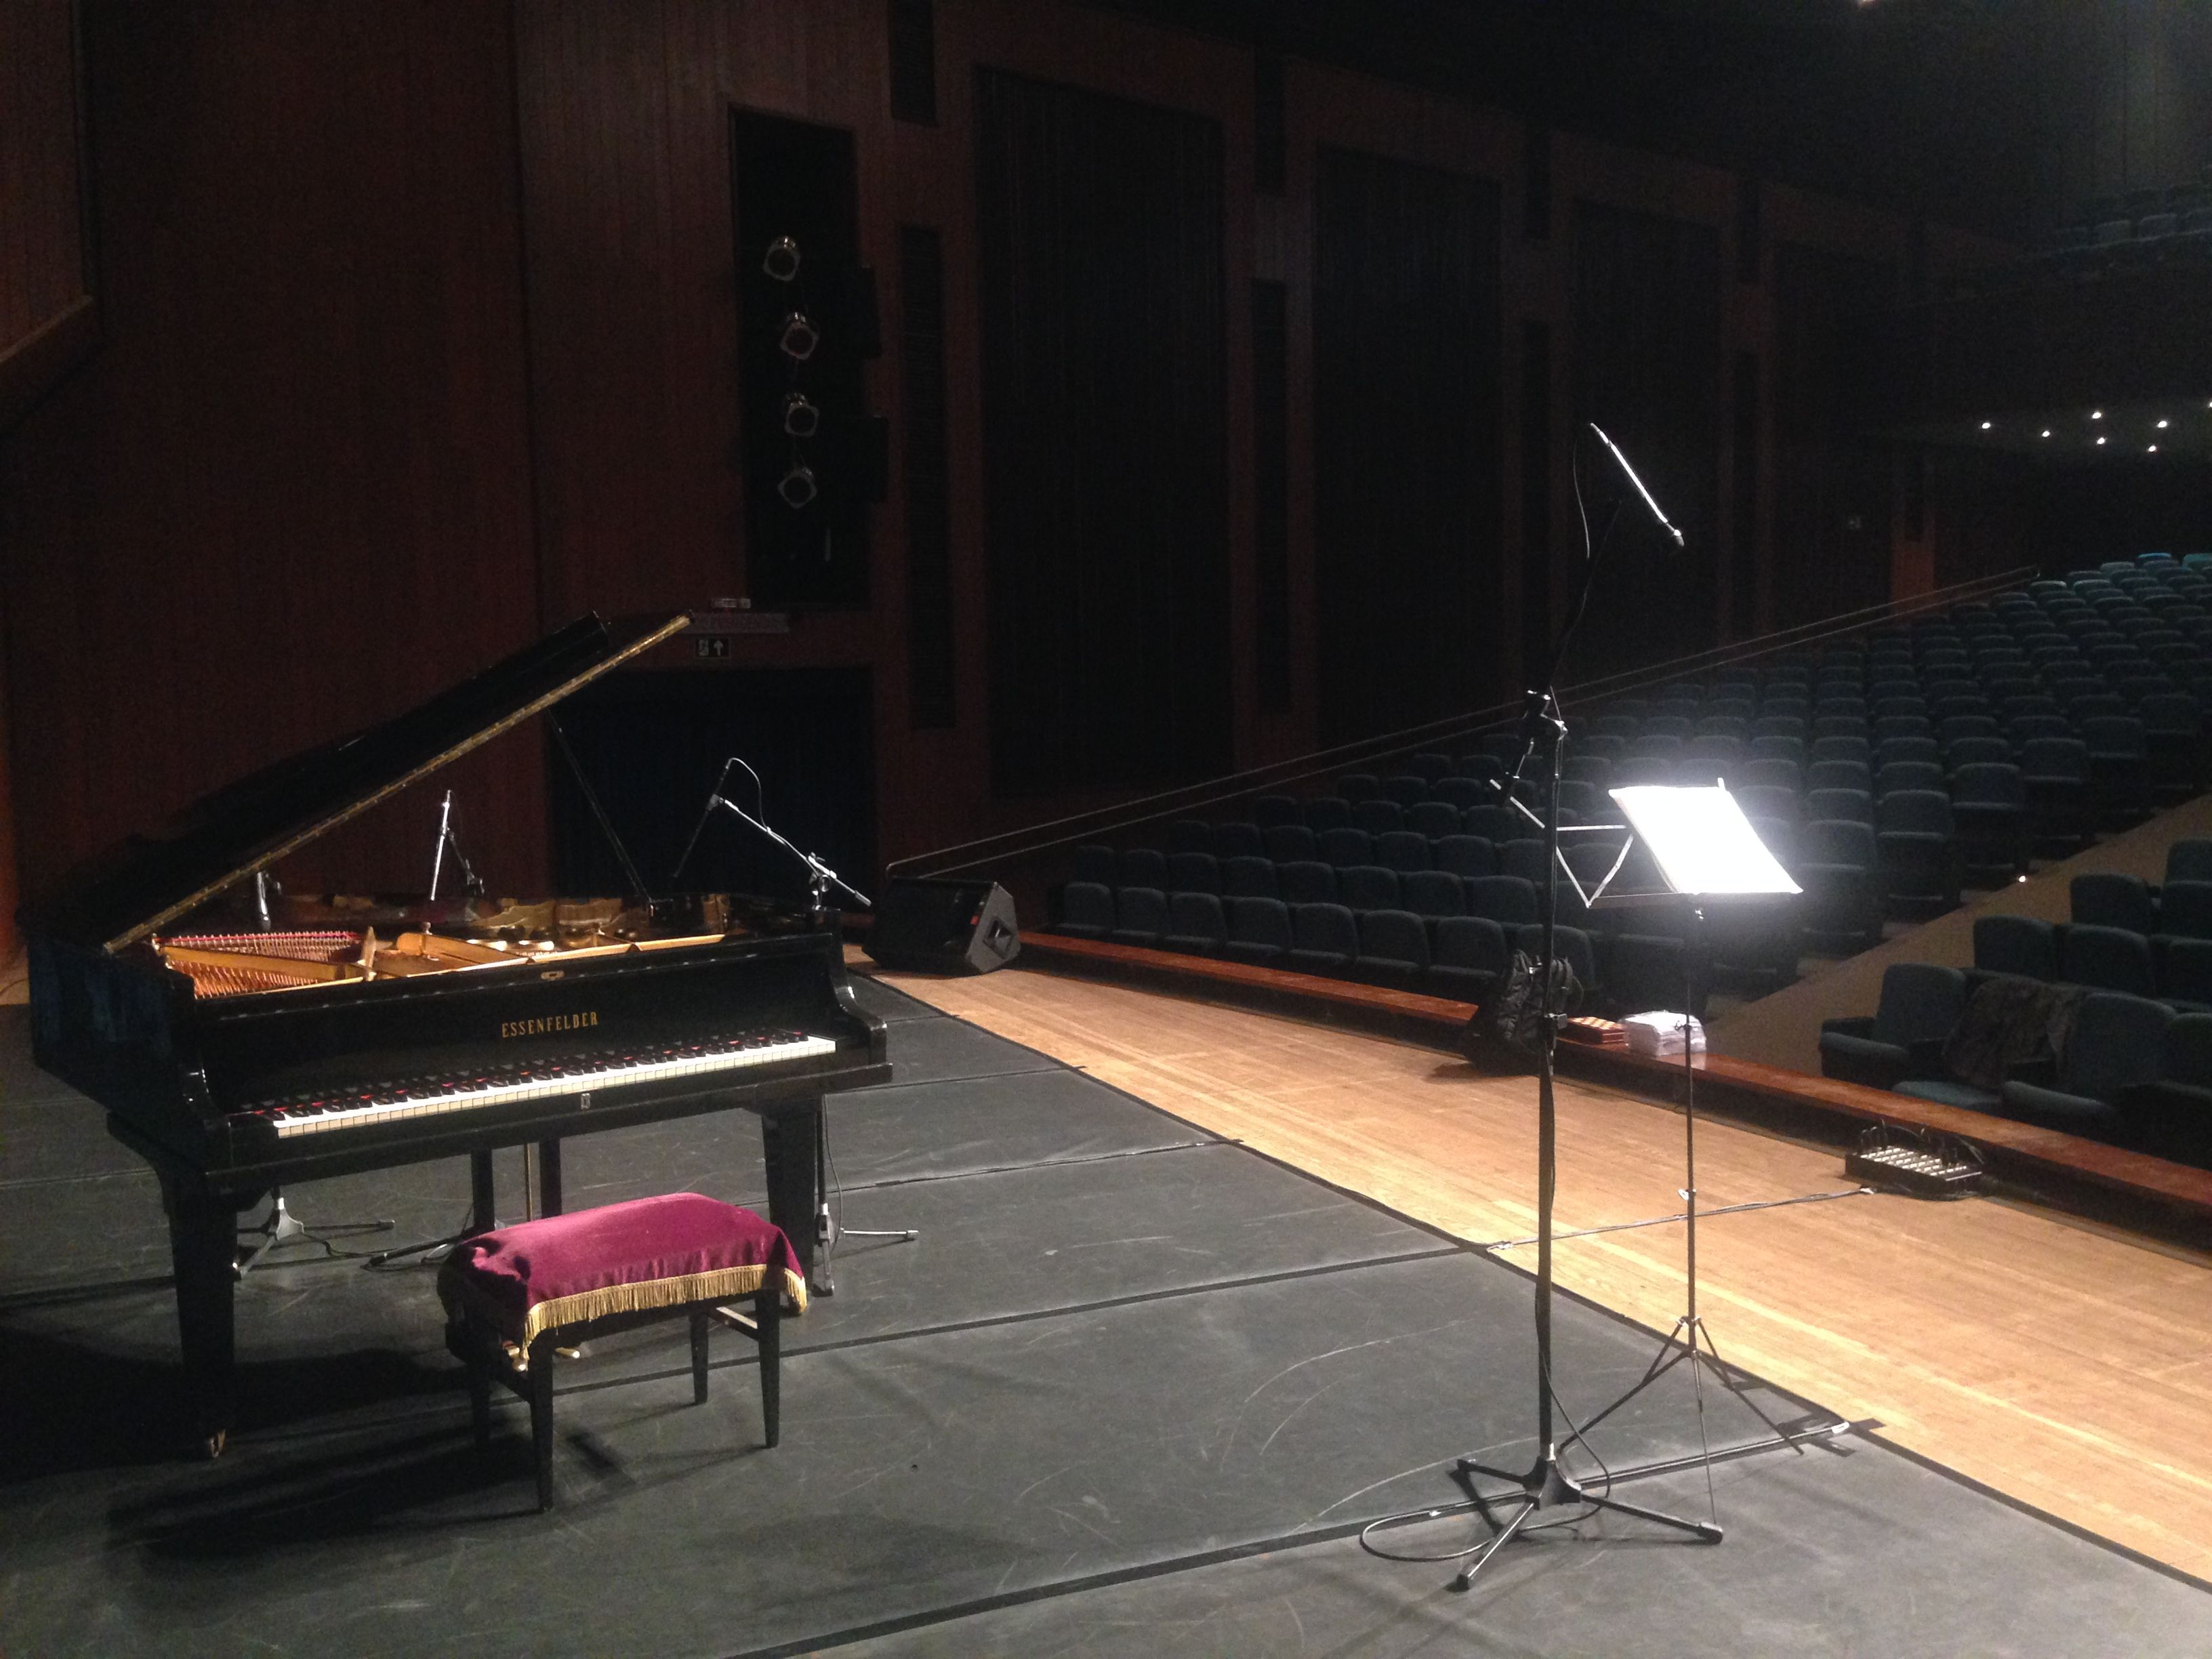 Teatro Municipal De Toledo Pr Belo Edif Cio Audit Rio Com  -> Sala De Tv Improvisada